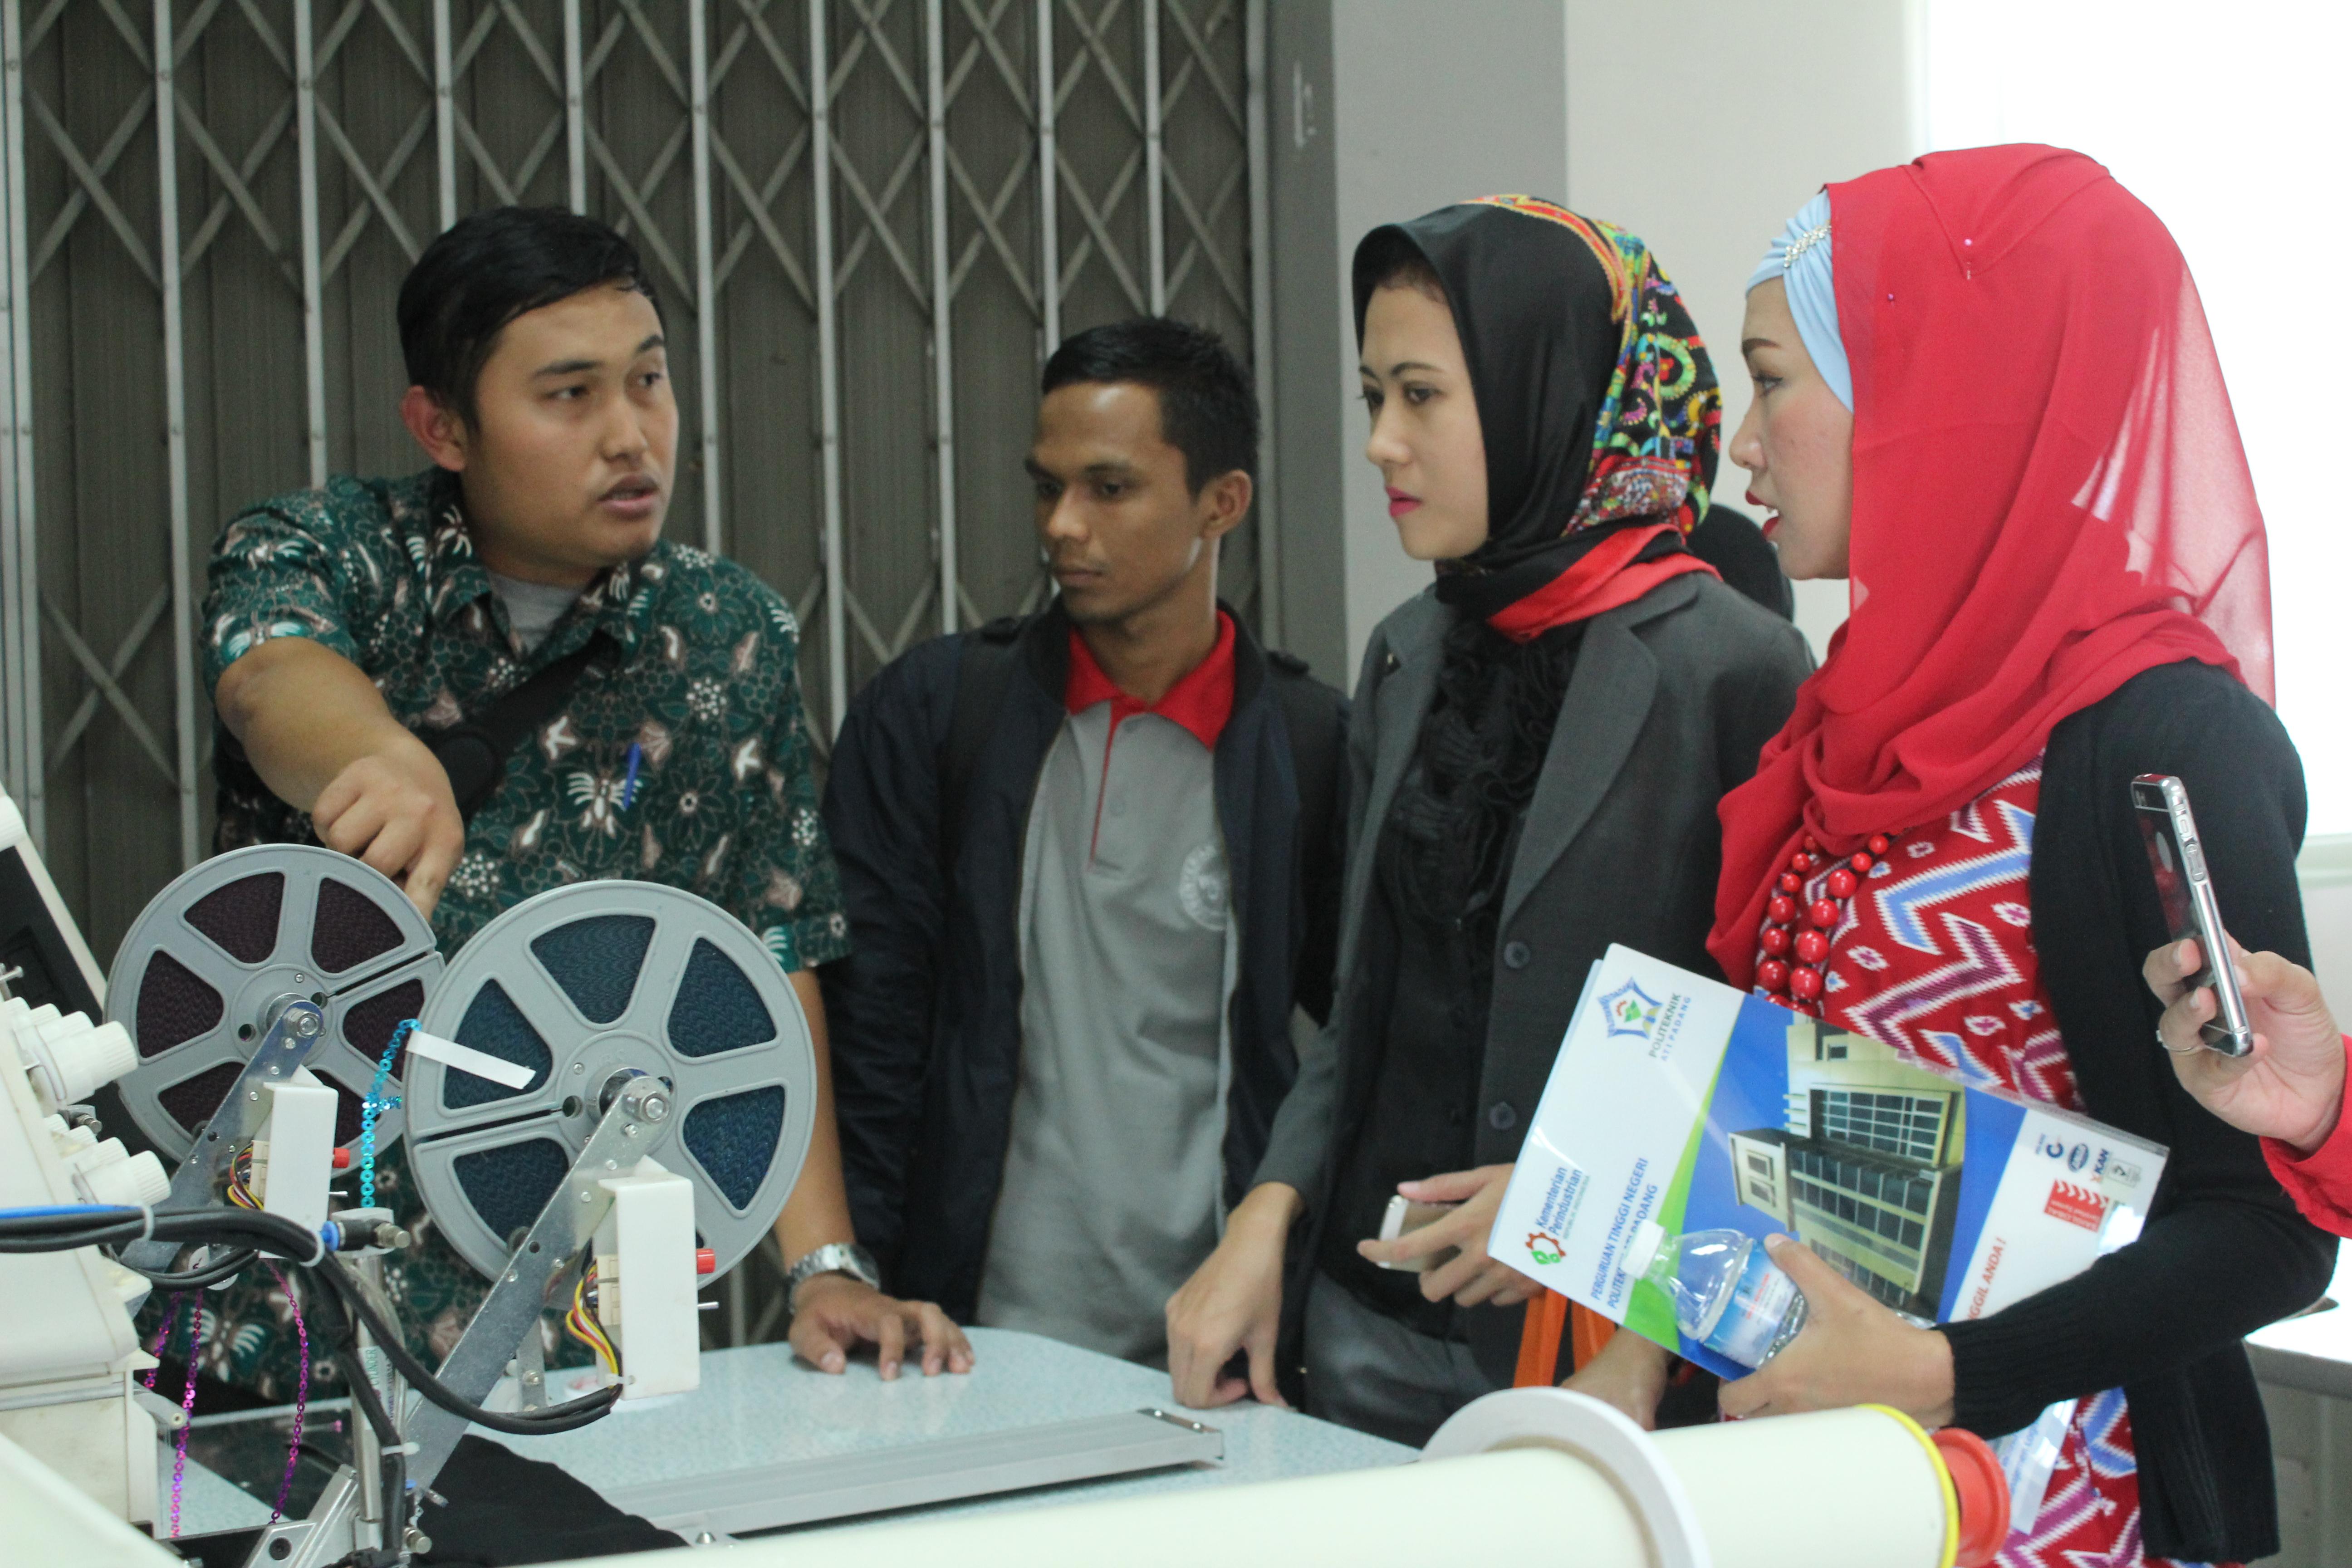 Peserta Forum Tematik Bakohumas mendapat penjelasan dari pengelola Politeknik ATI Padang, di Padang, Sumbar, Kamis (16/3) siang. (Foto: Rahmi/Humas)